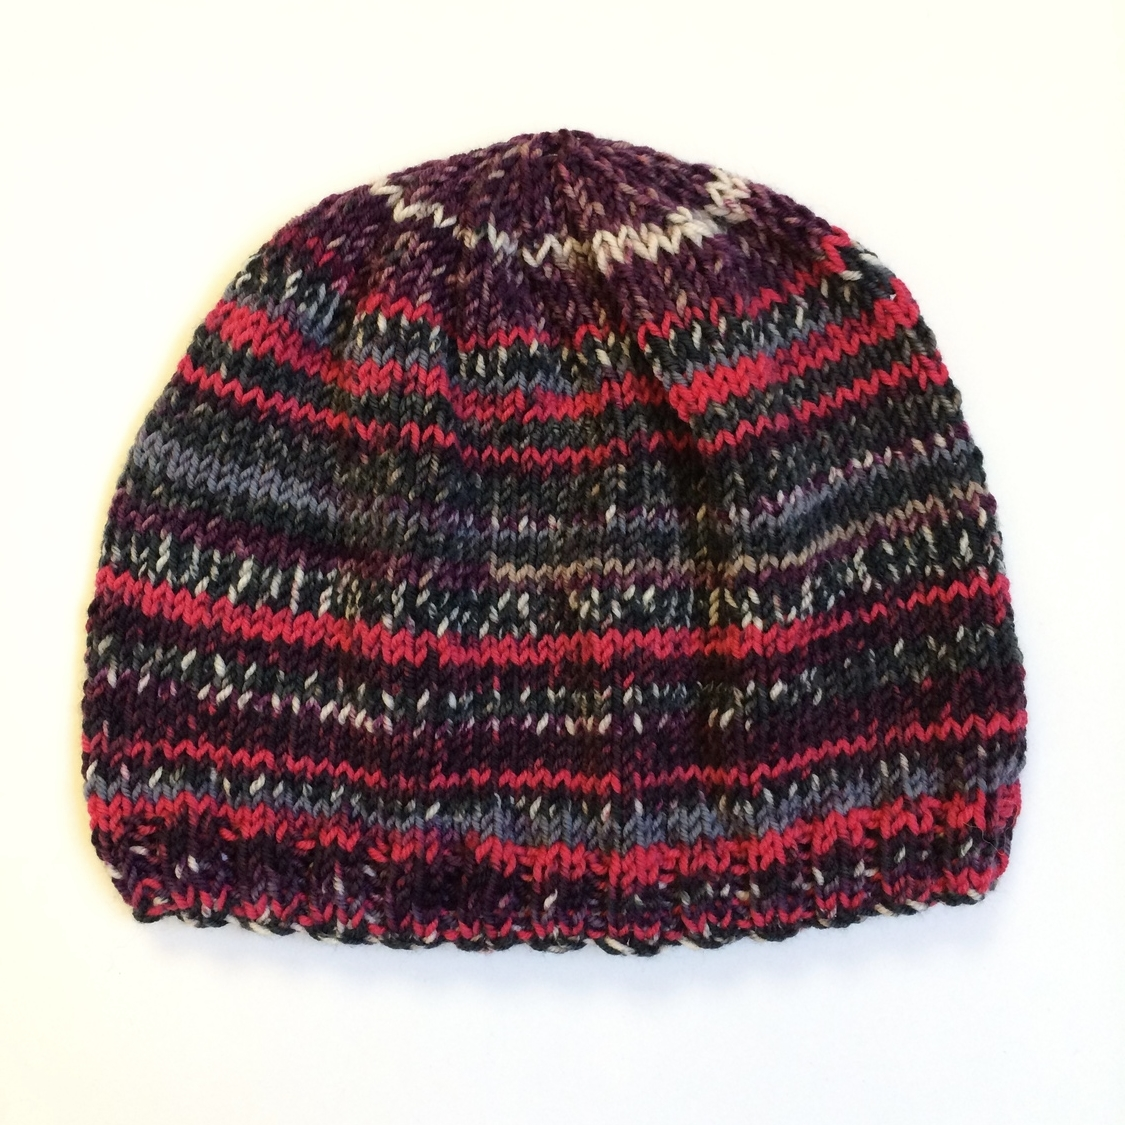 Free Knitting Pattern - Easy Ambiente Hat Pattern